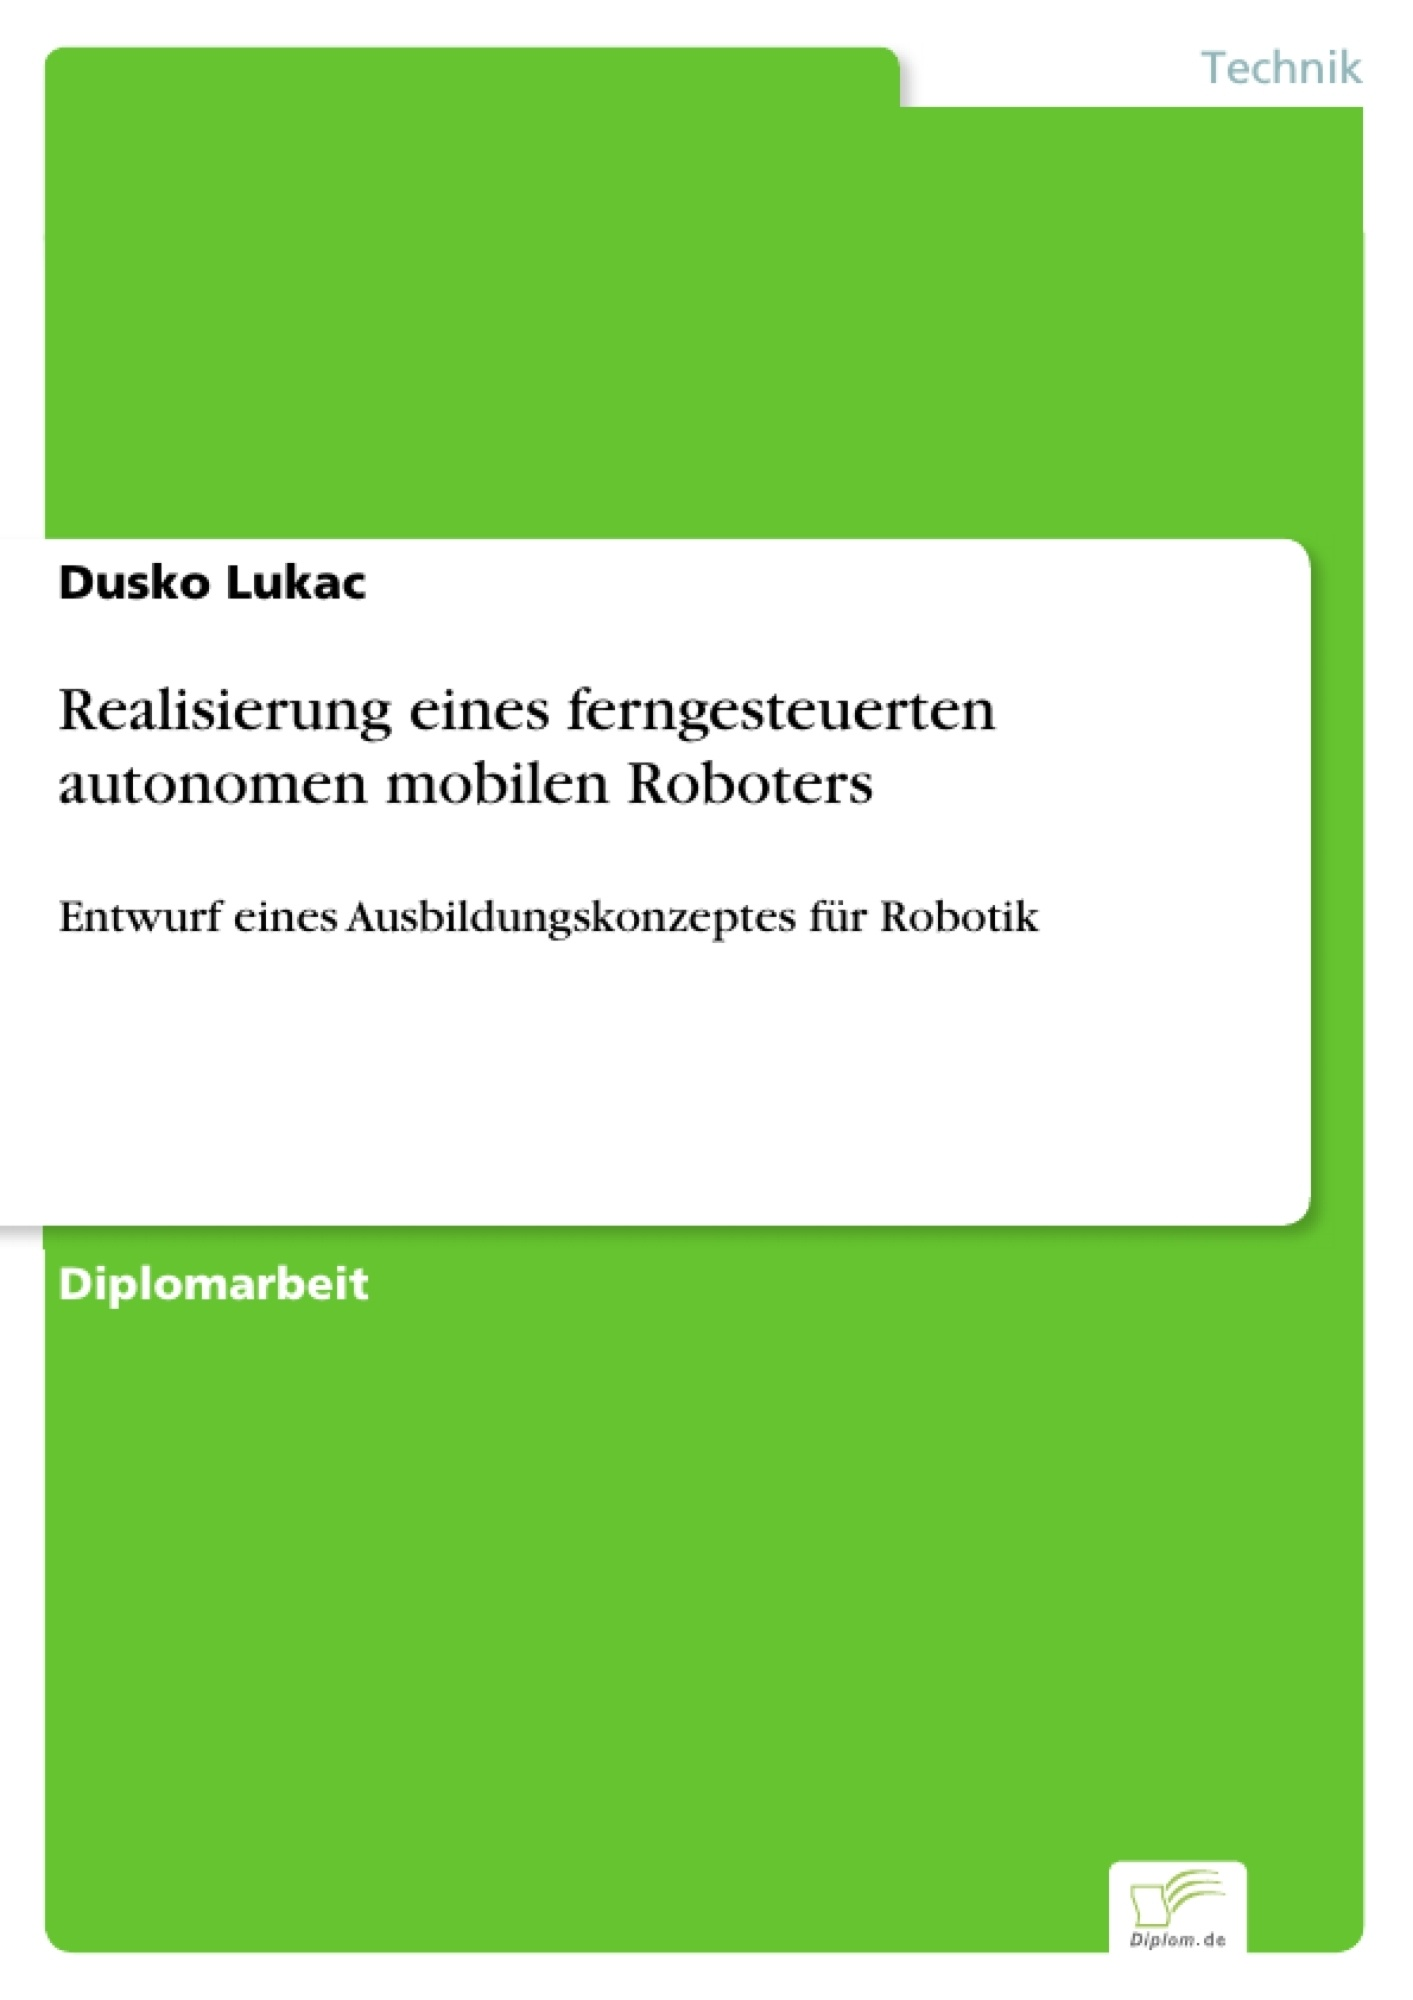 Realisierung eines ferngesteuerten autonomen mobilen Roboters